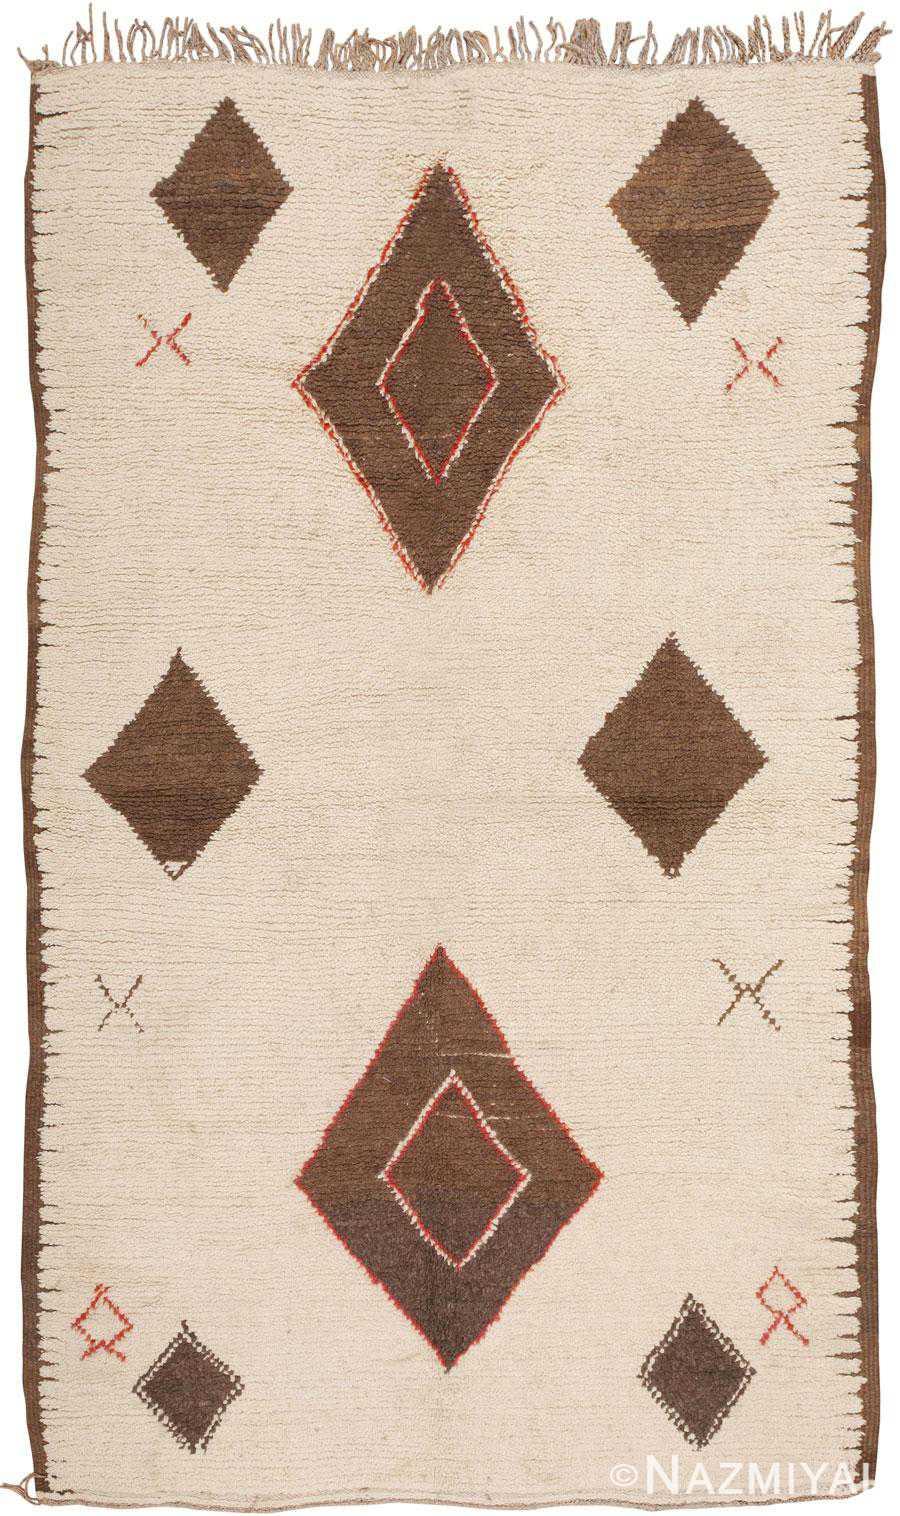 Vintage Moroccan Rug 45618 Detail/Large View